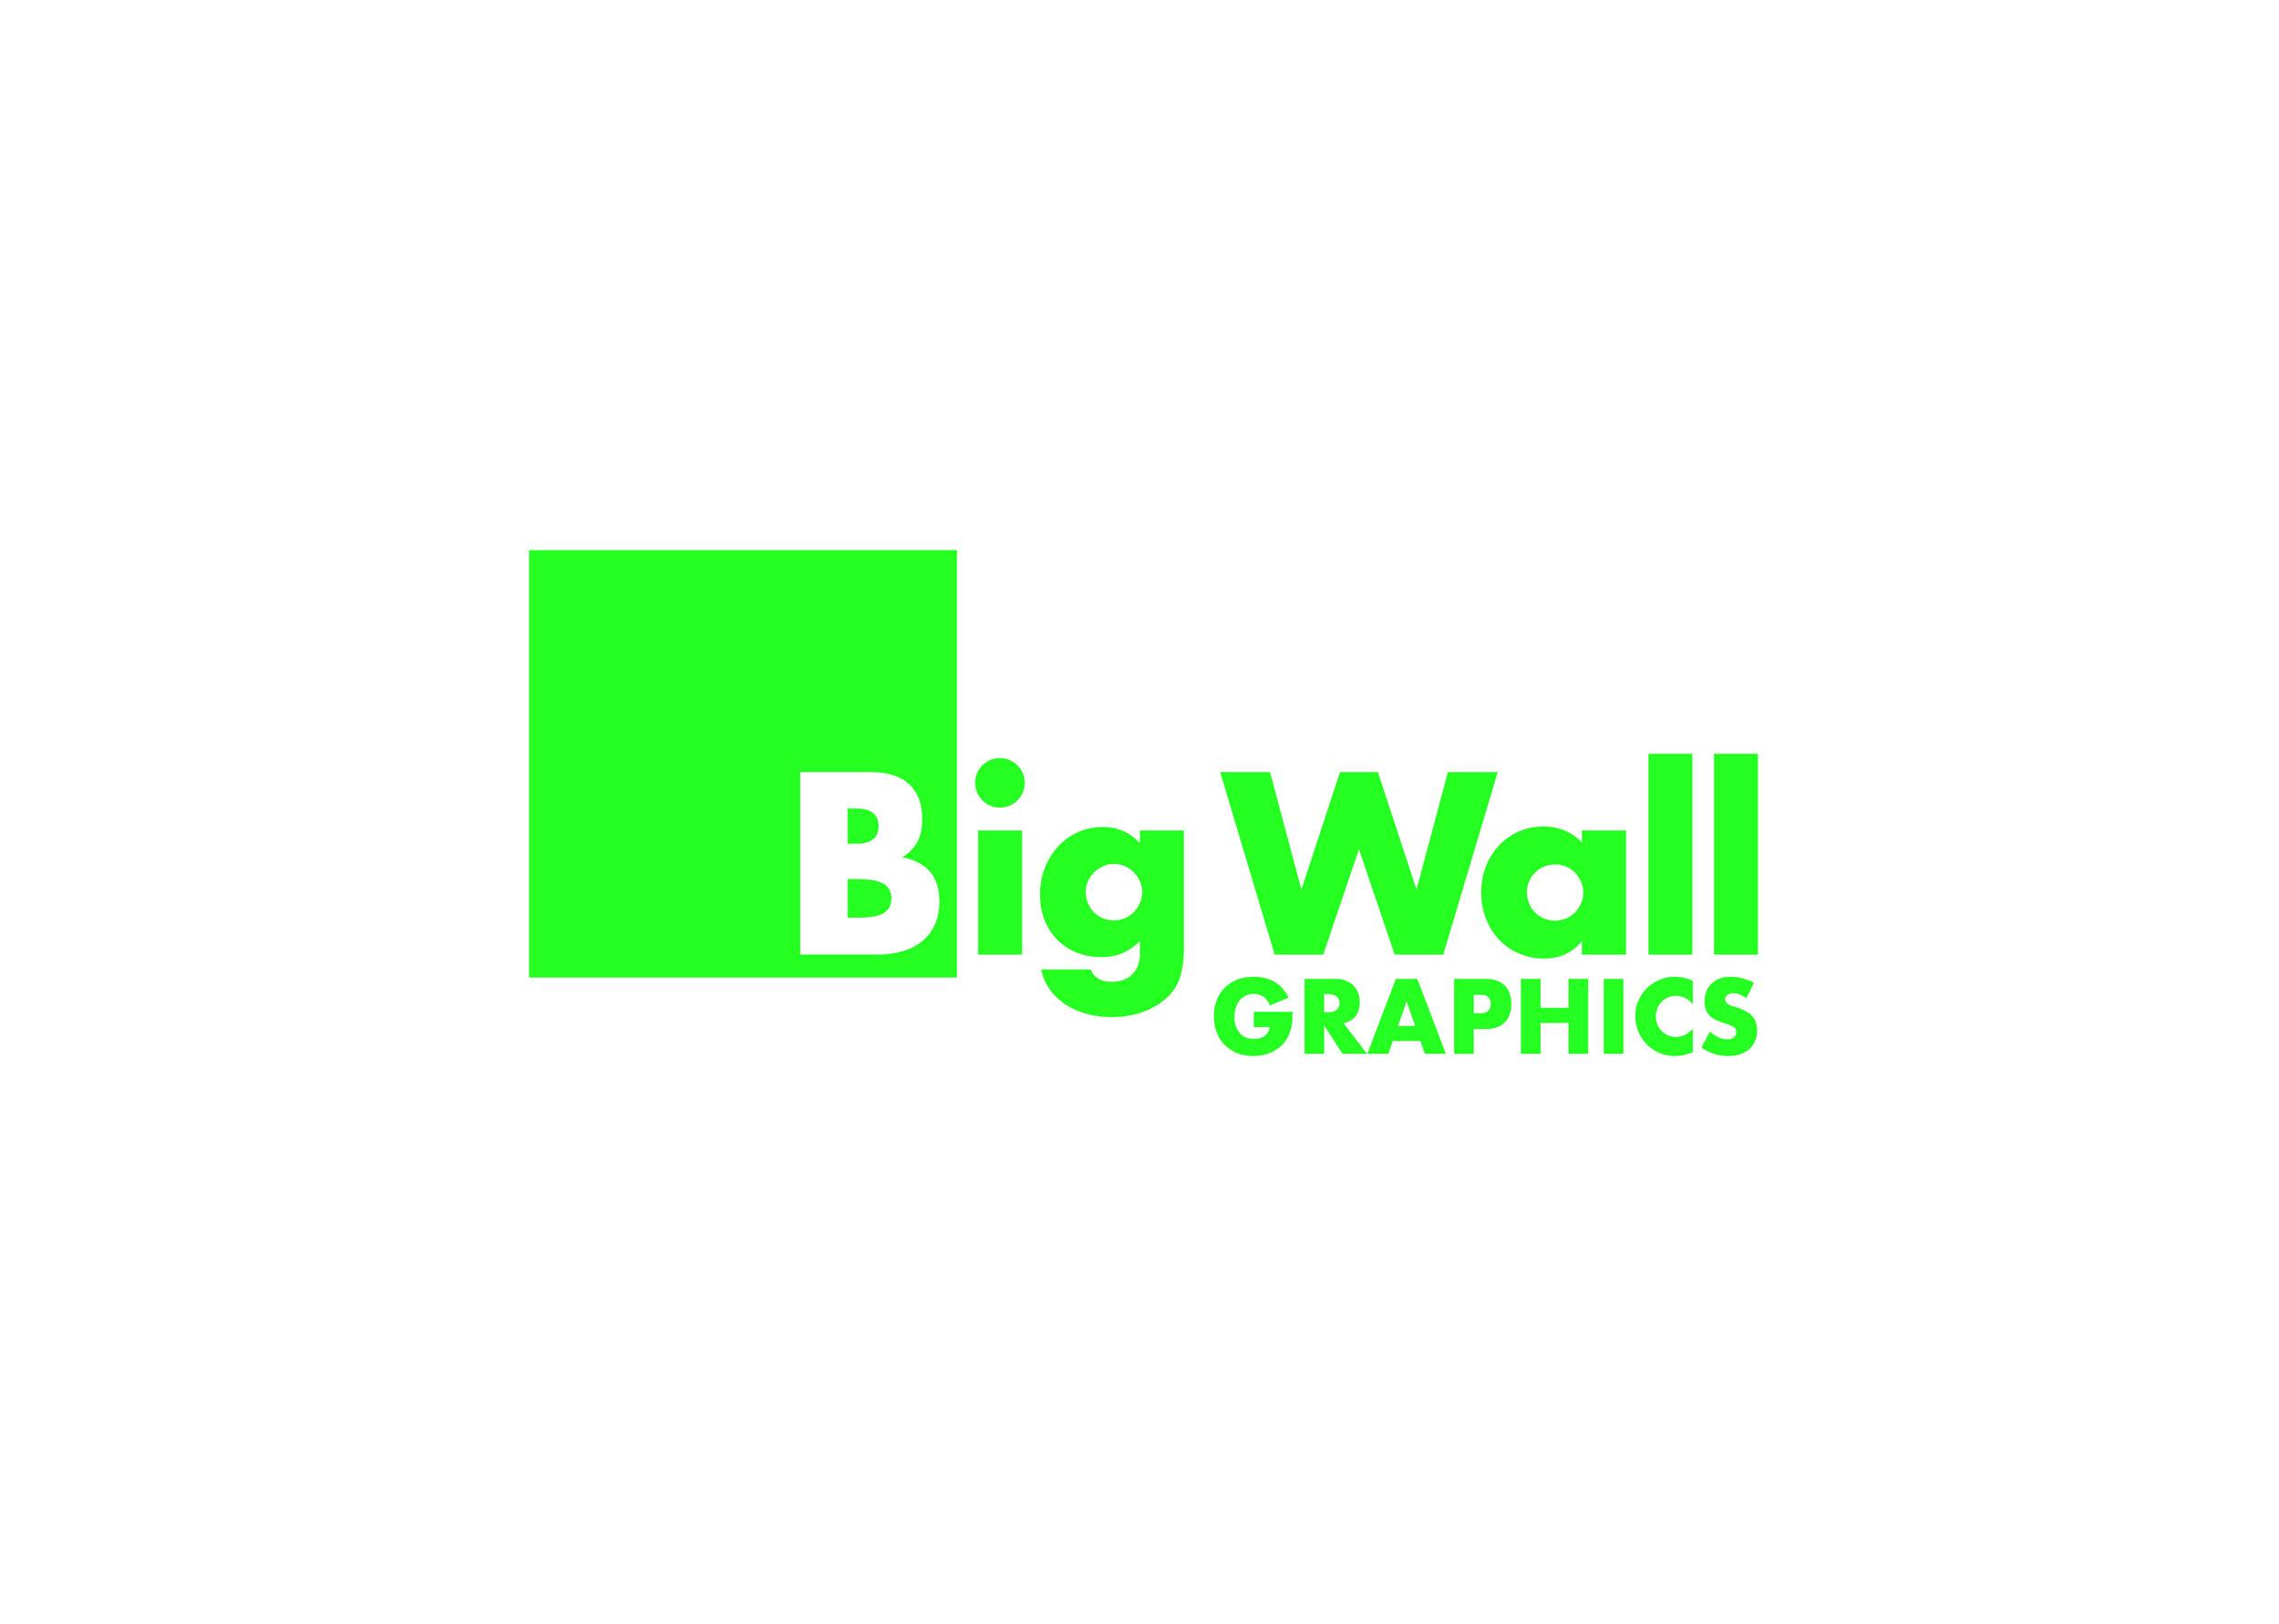 Big Wall Graphics Logo_27_2_green-01.jpg